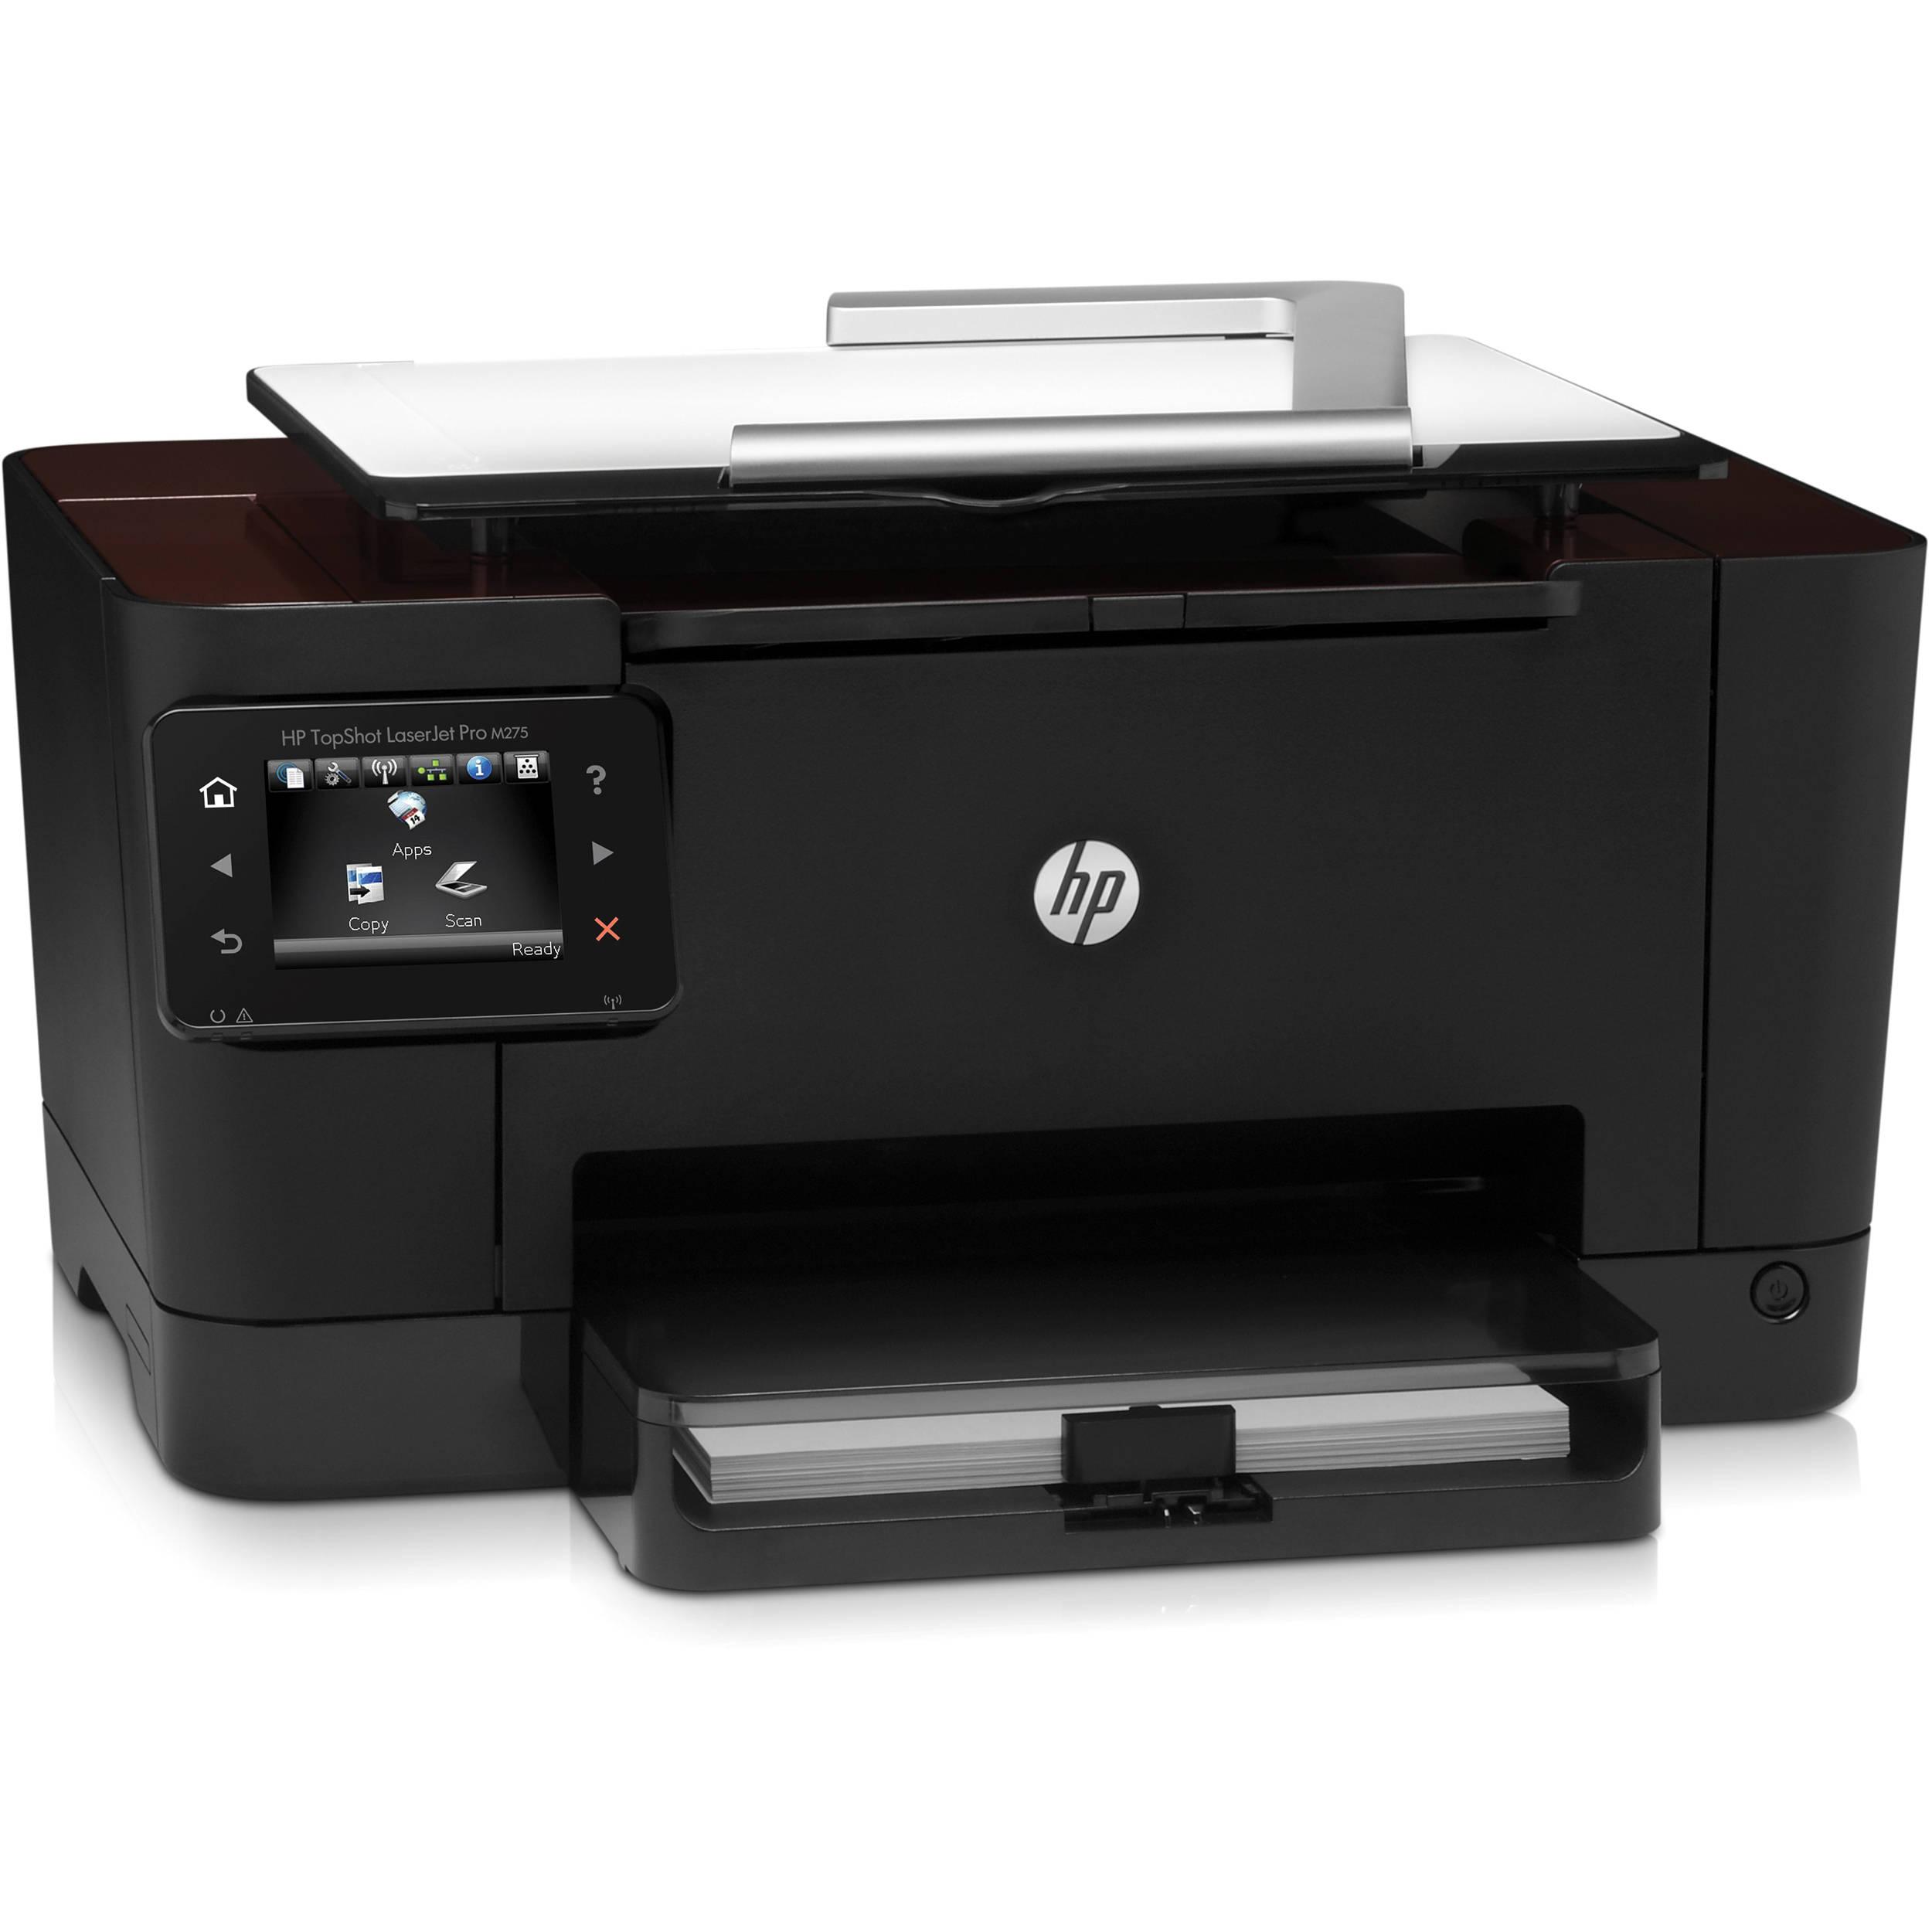 Принтер HP TopShot LaserJet Pro M275 MFP